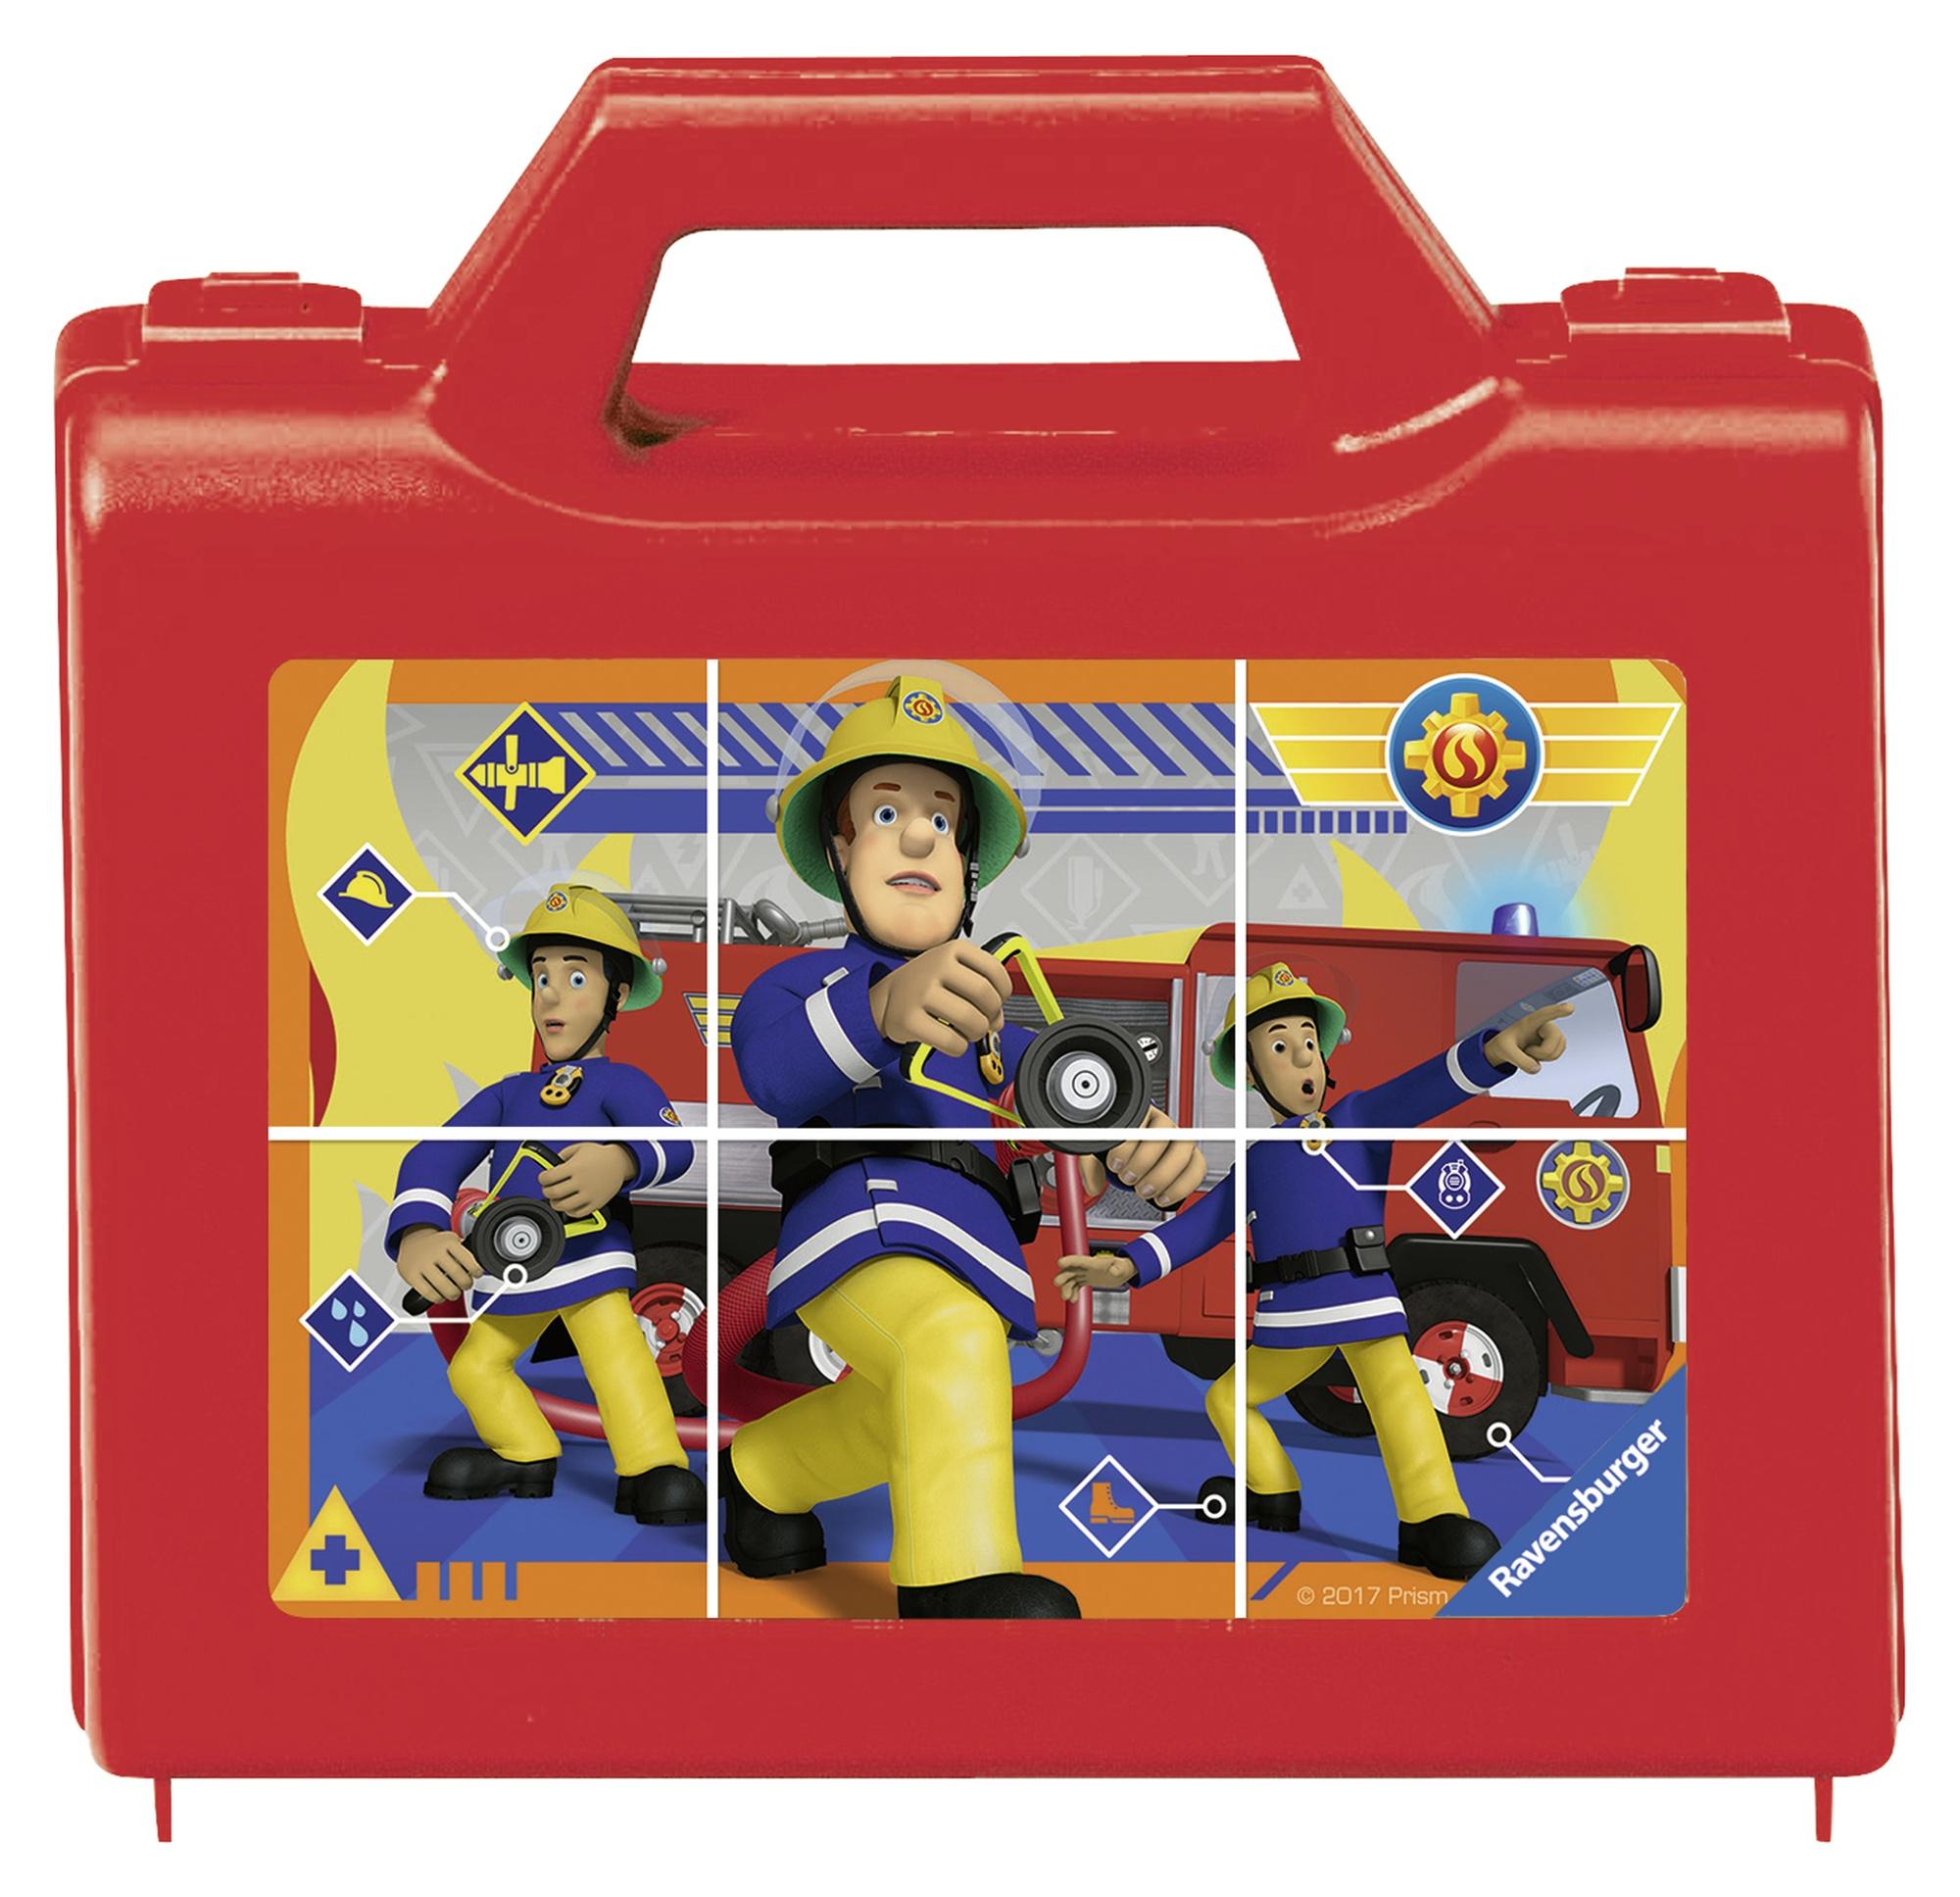 Puzzle in cutie pompier 6 piese ravensburger